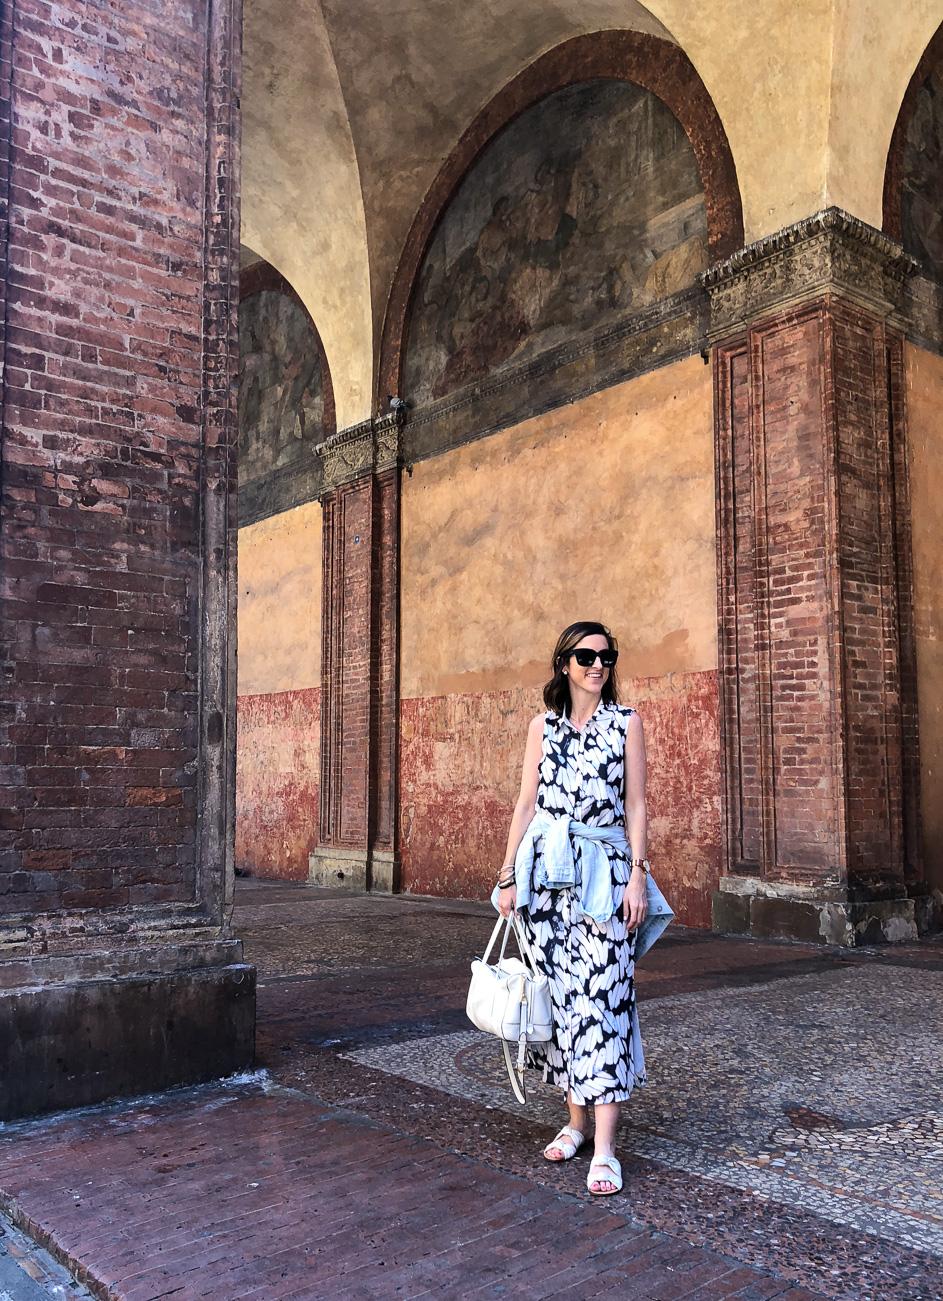 Food Tour Italy   Bologna, Italy   Cobalt Chronicles   Washington, DC Travel Blogger